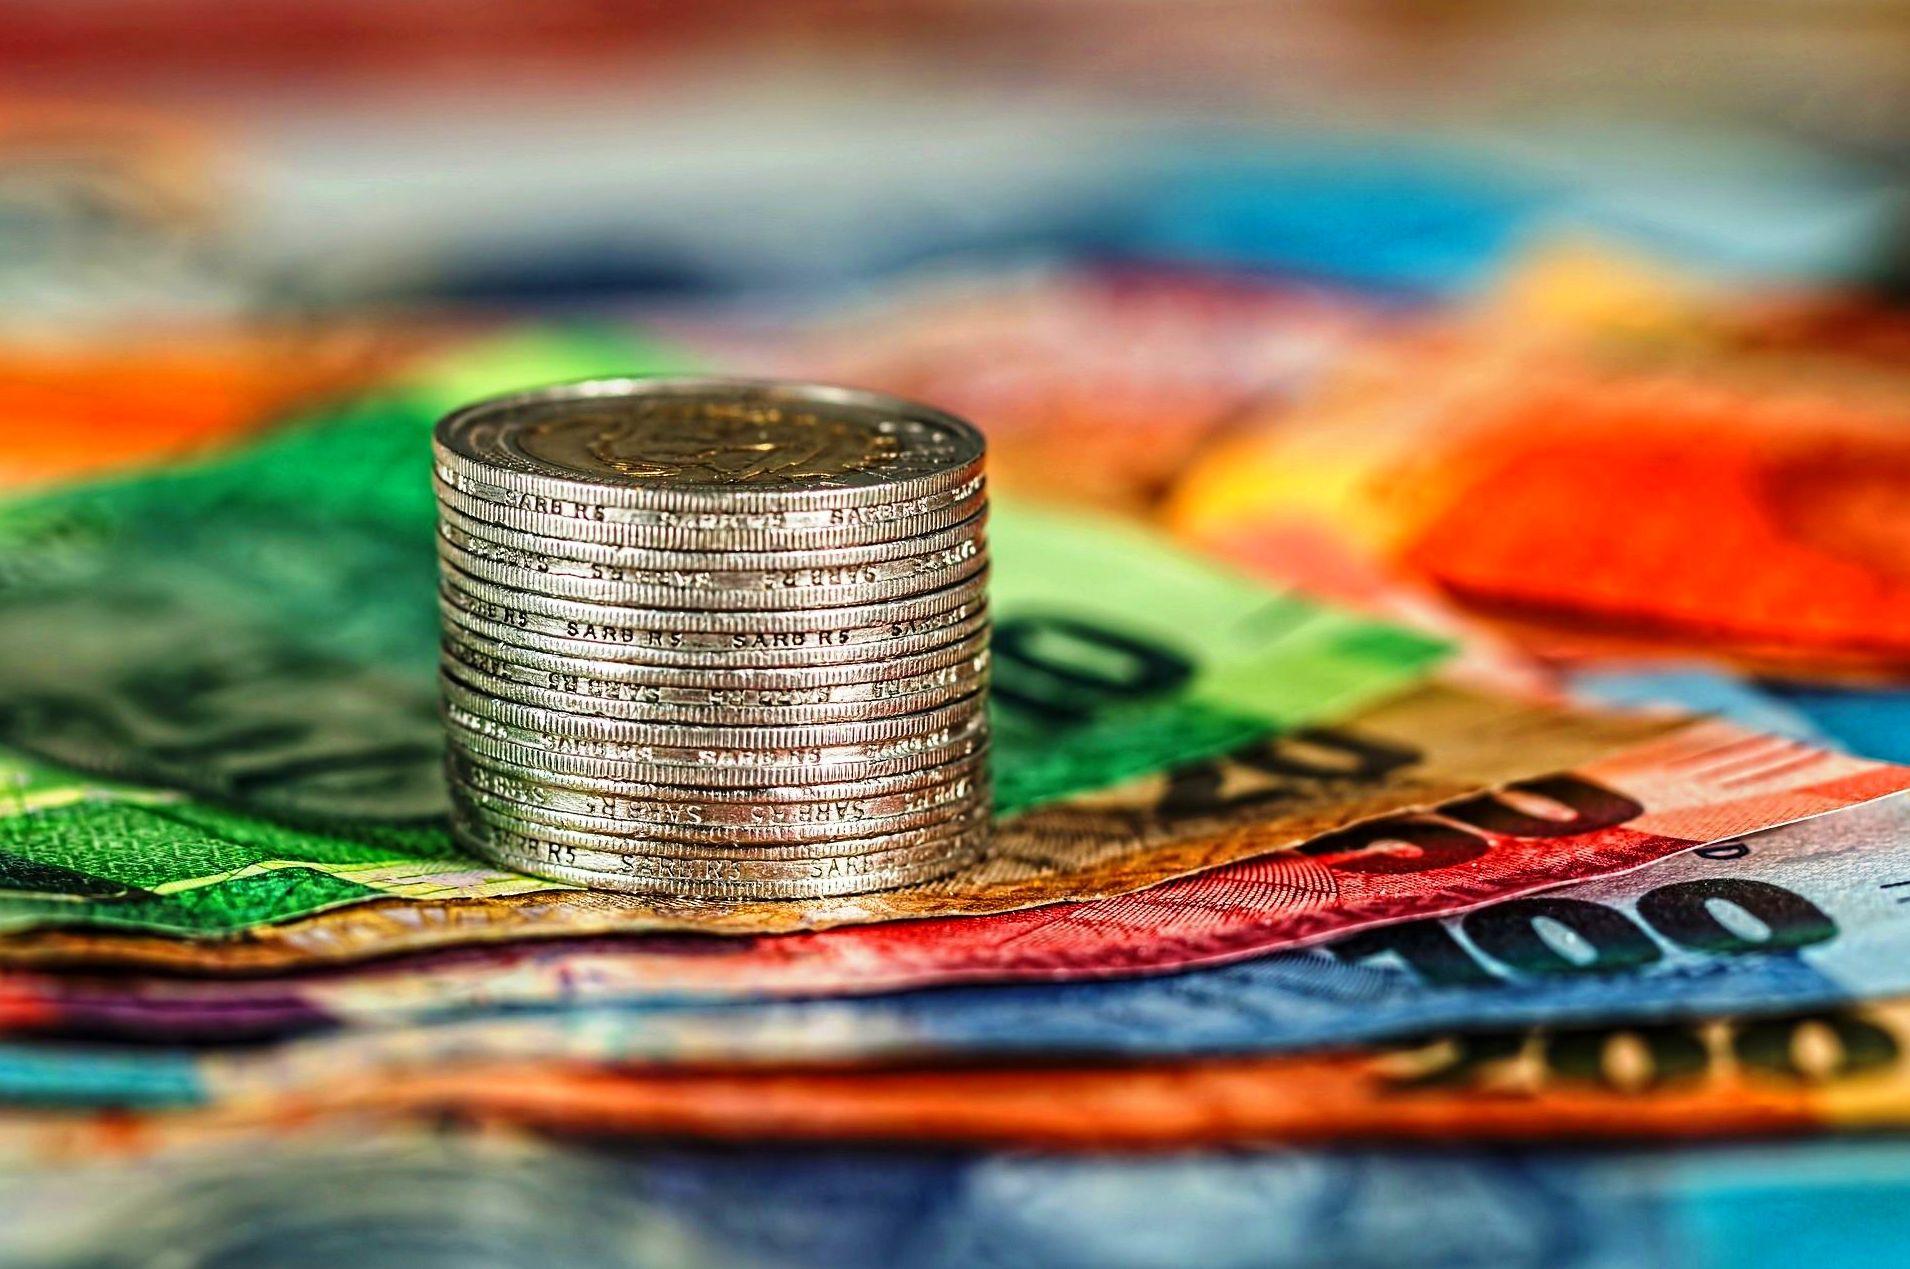 Préstamo de dinero urgente - Private Credit